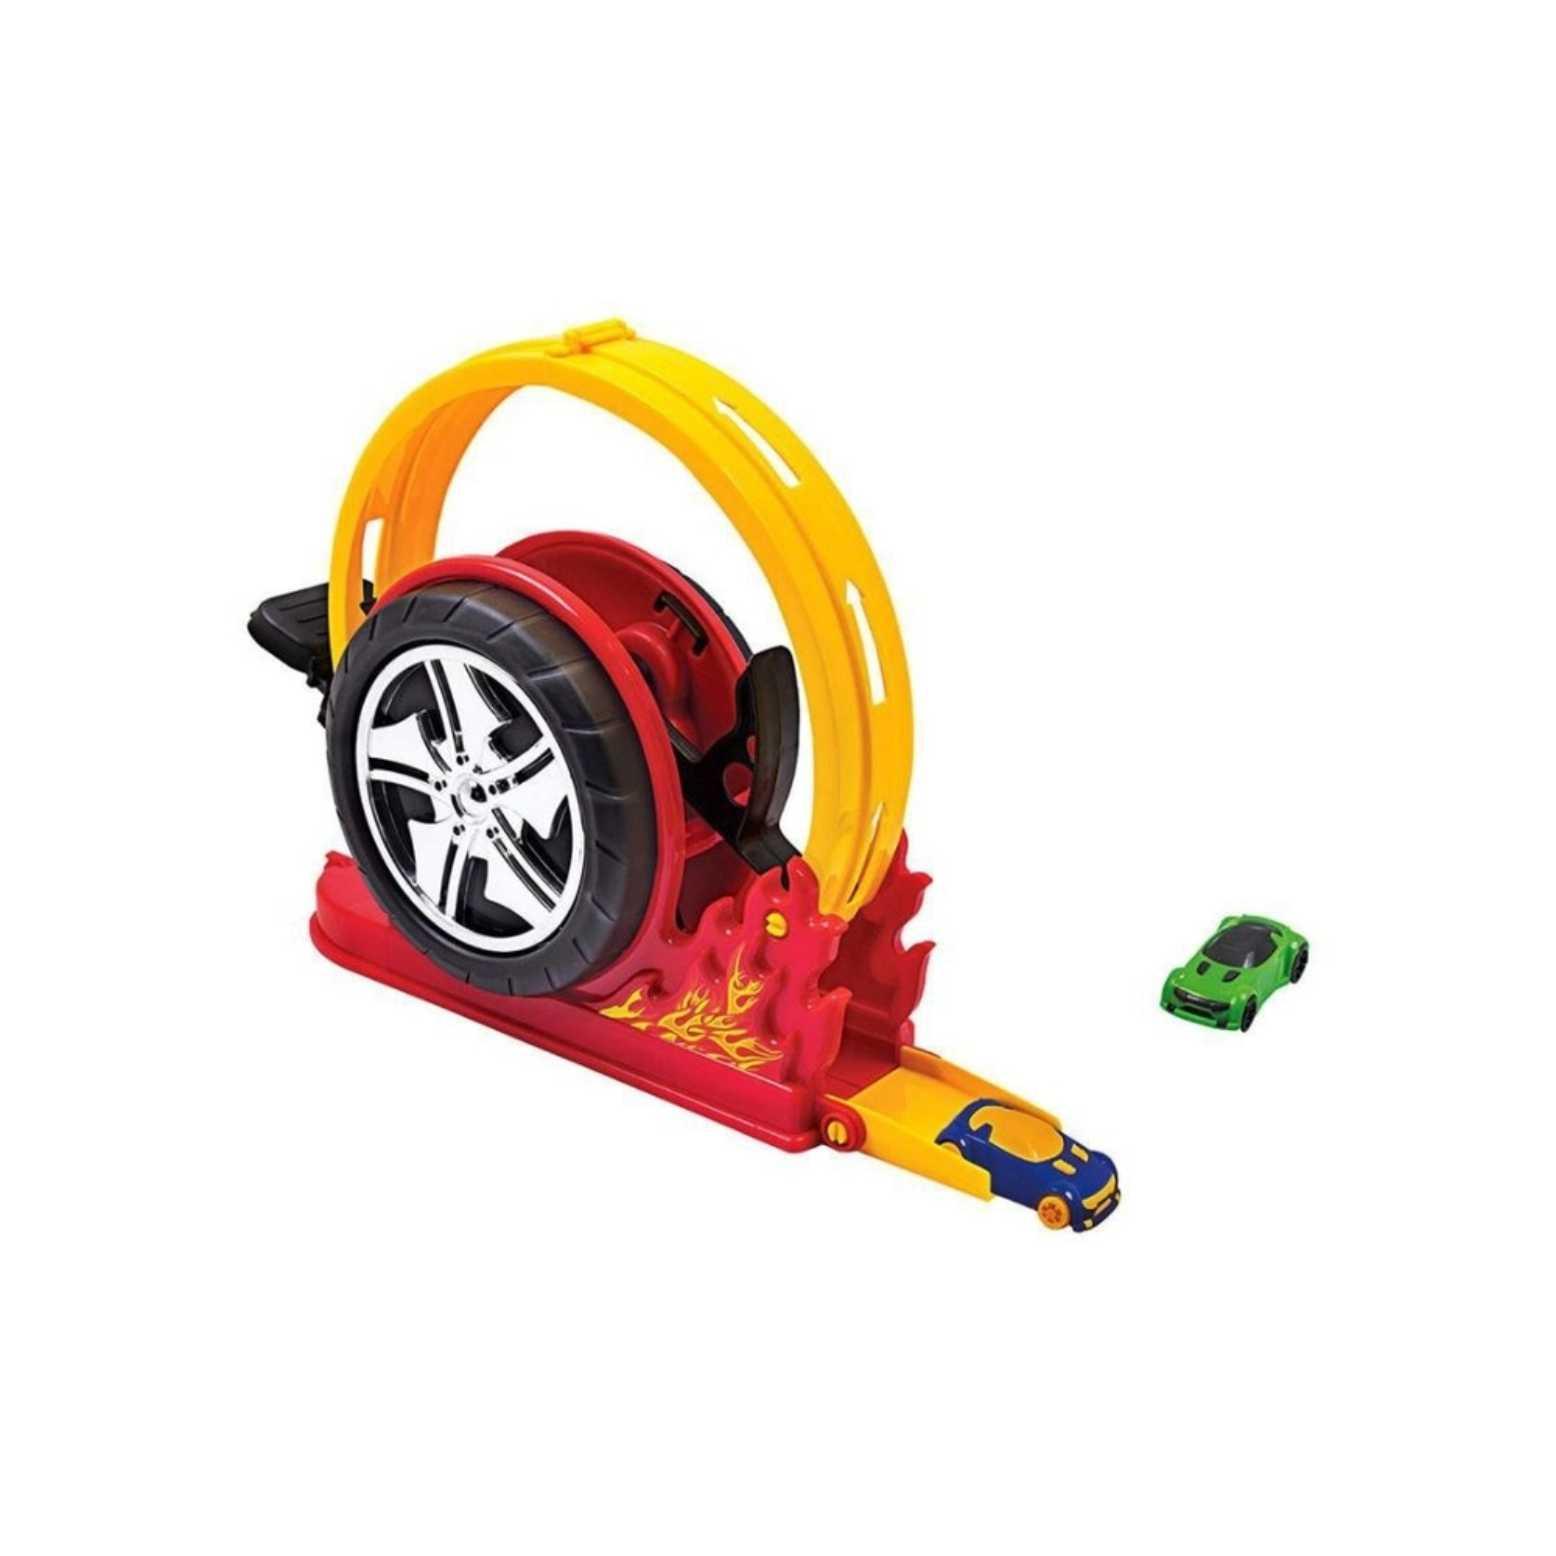 Pista Lançador Crazy Street Mega Speed - Bs Toys